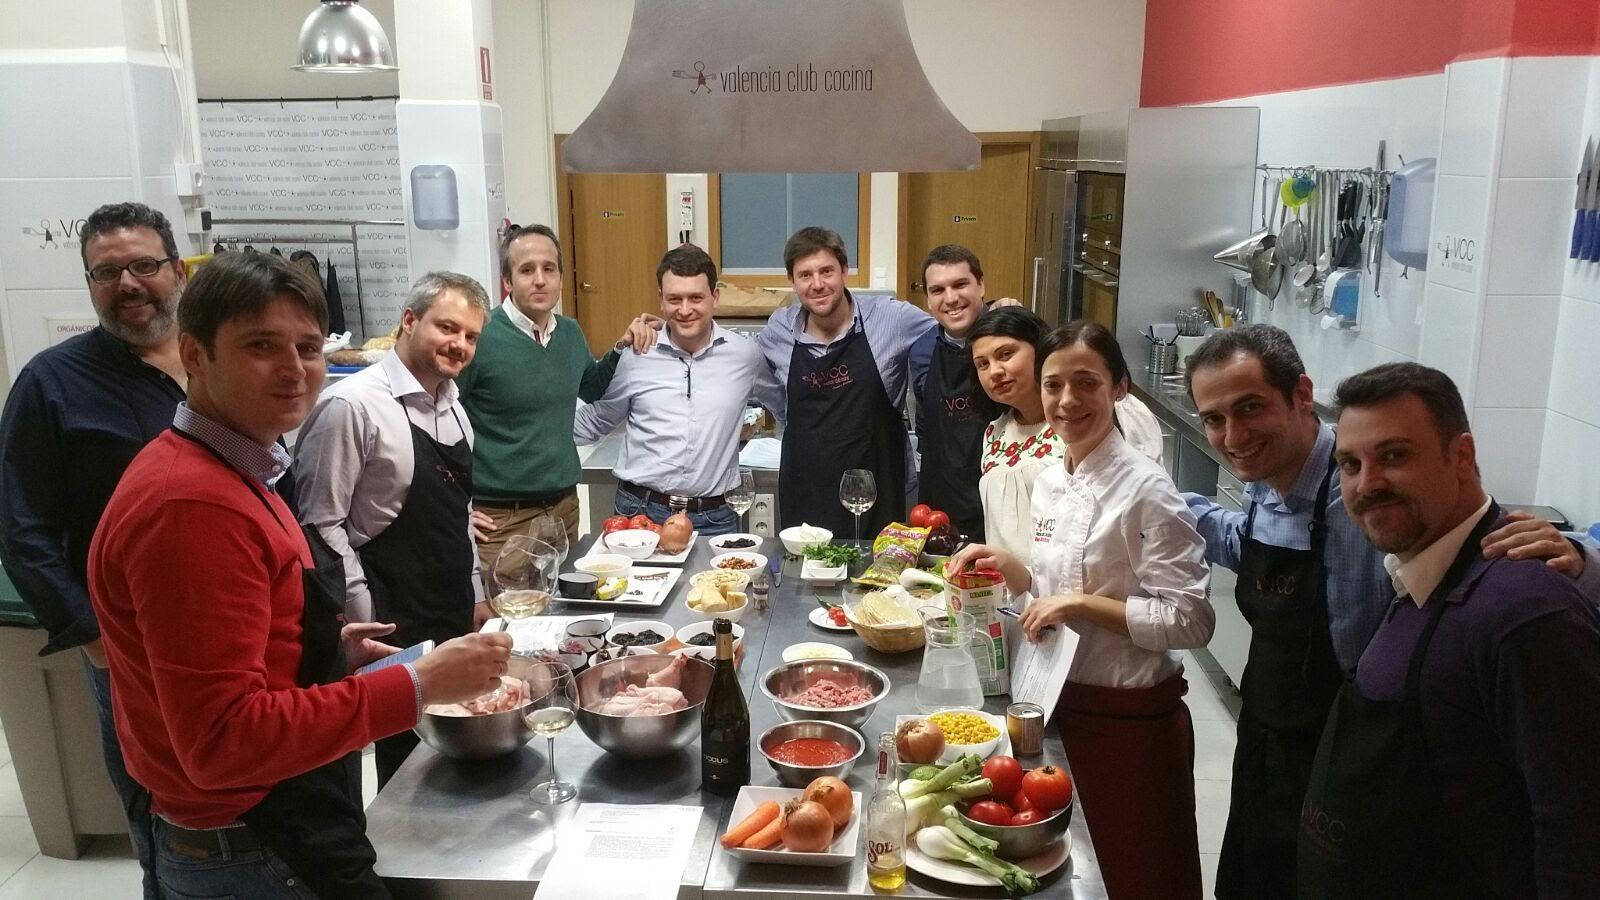 Bonito cursos de cocina en valencia galer a de im genes - Talleres de cocina en valencia ...